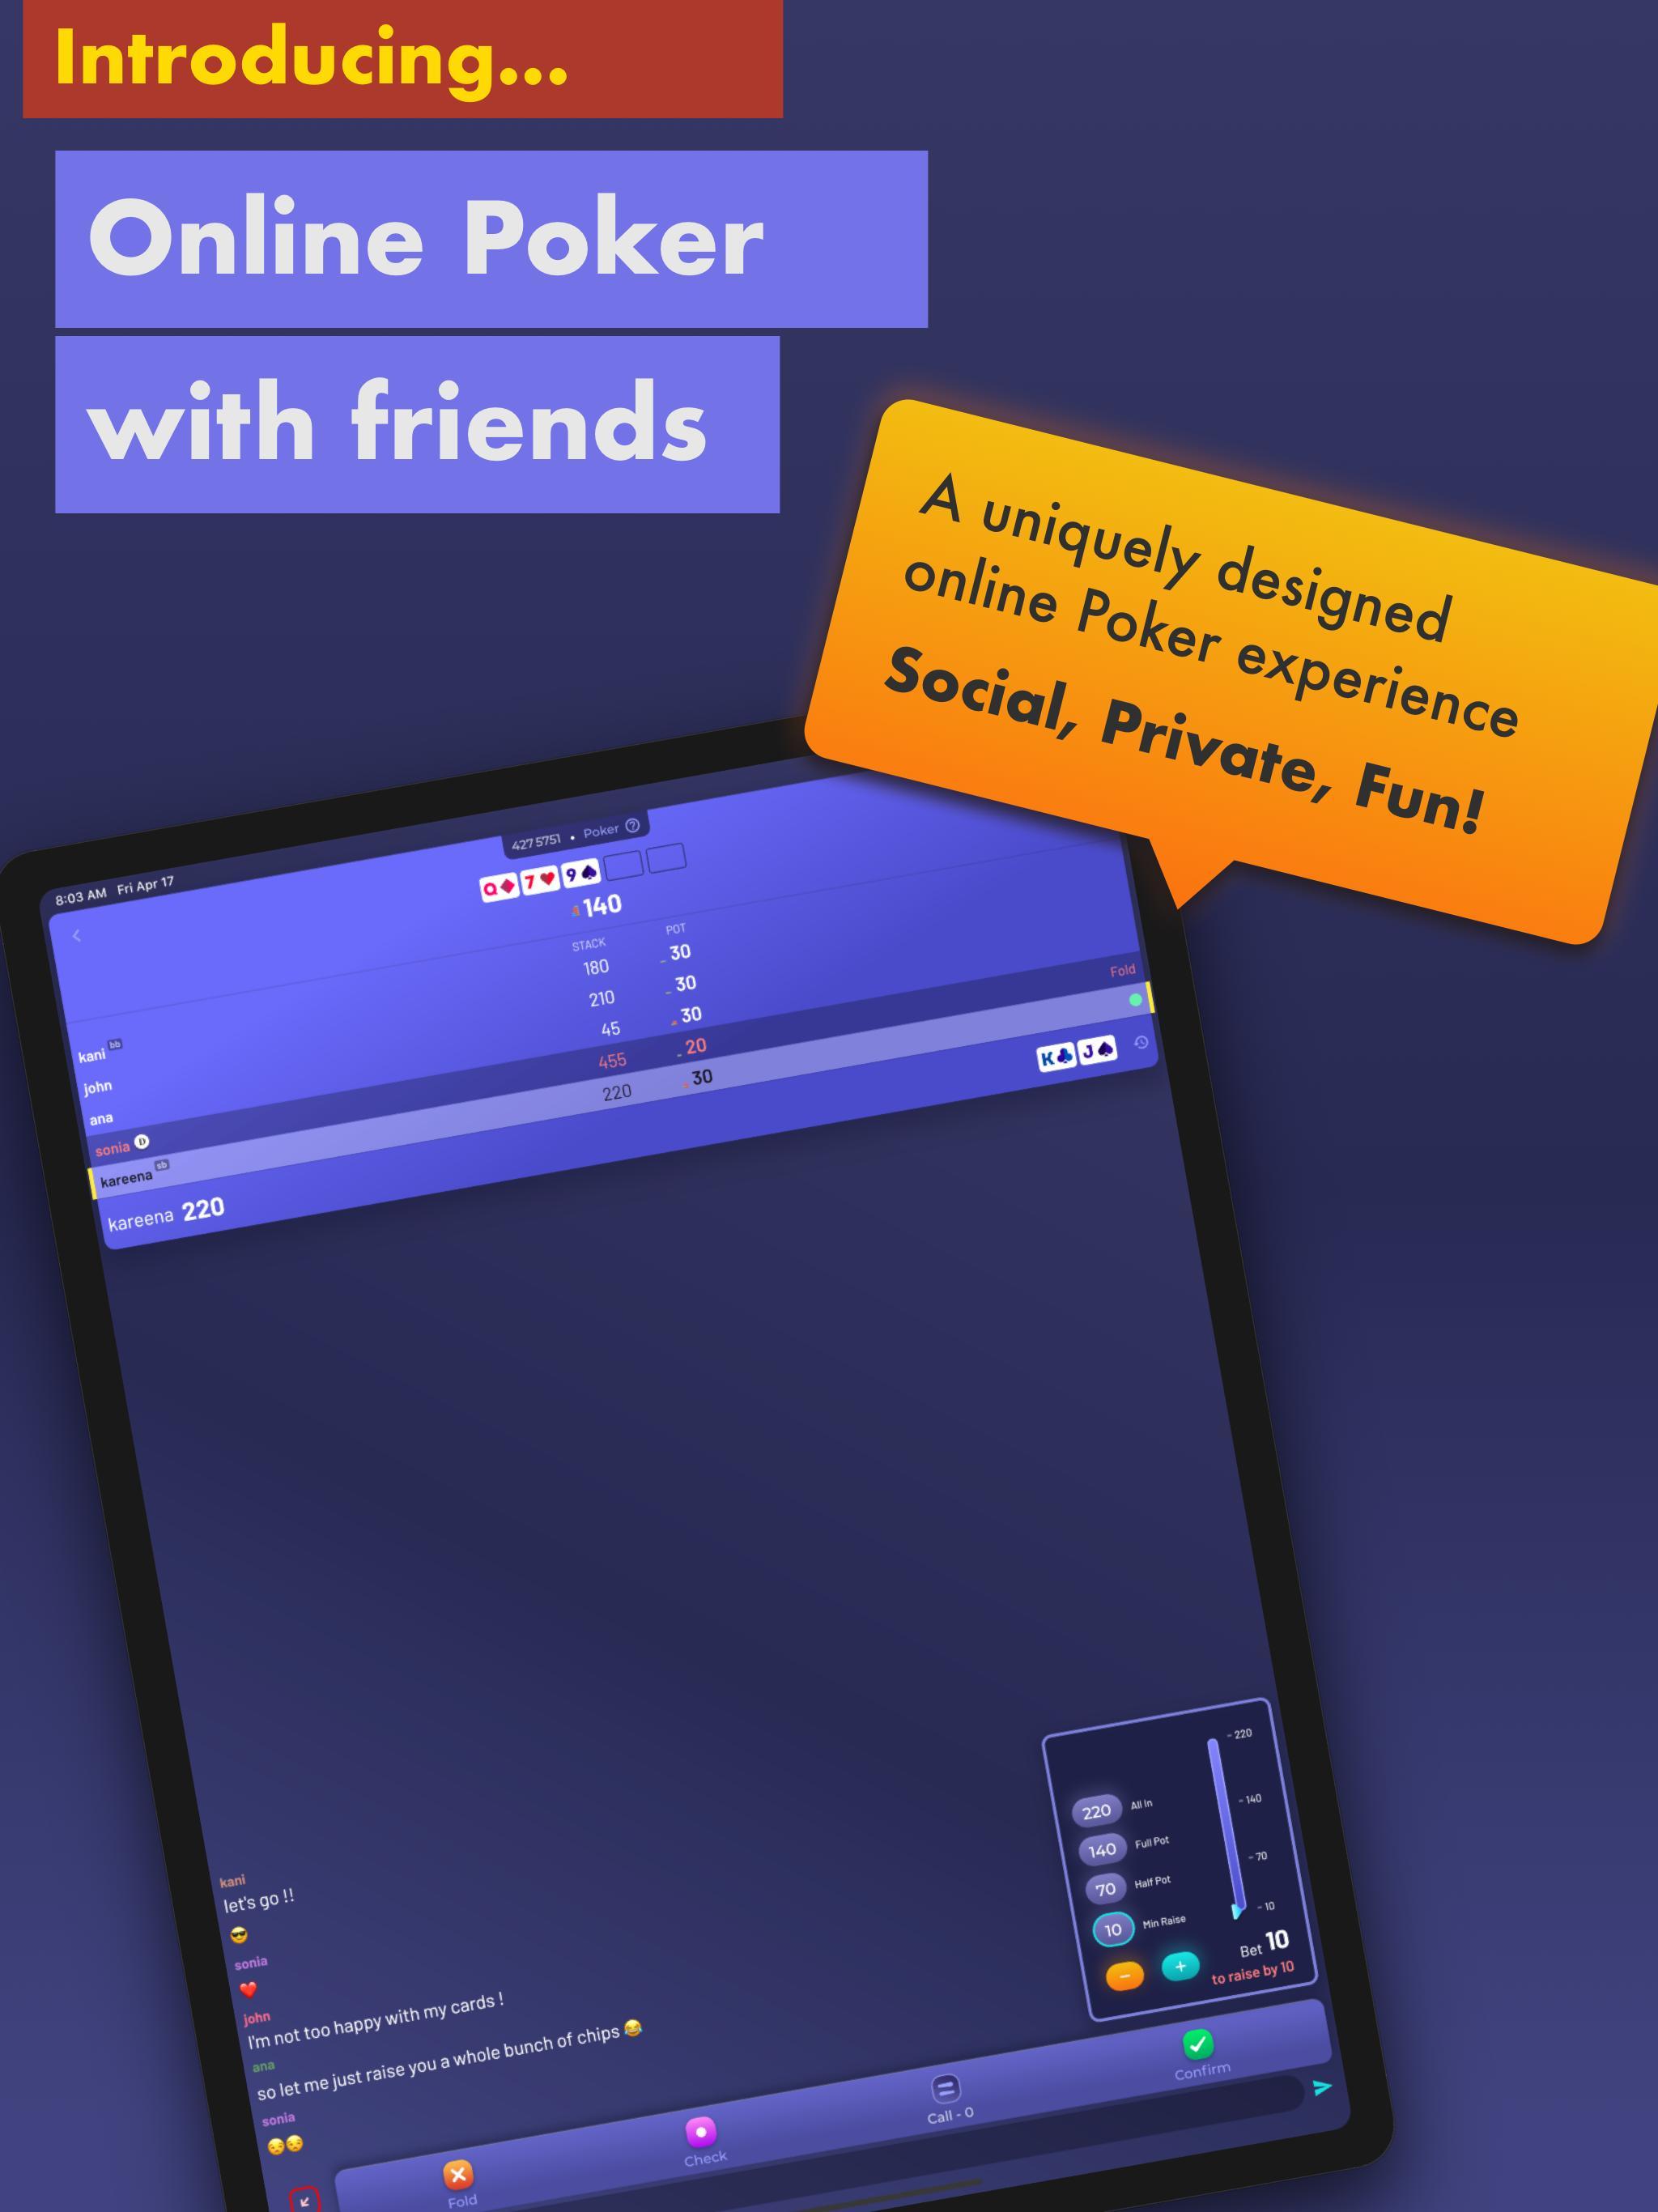 Chips of Fury Virtual Poker Chips, Poker Table 2.0.6 Screenshot 4